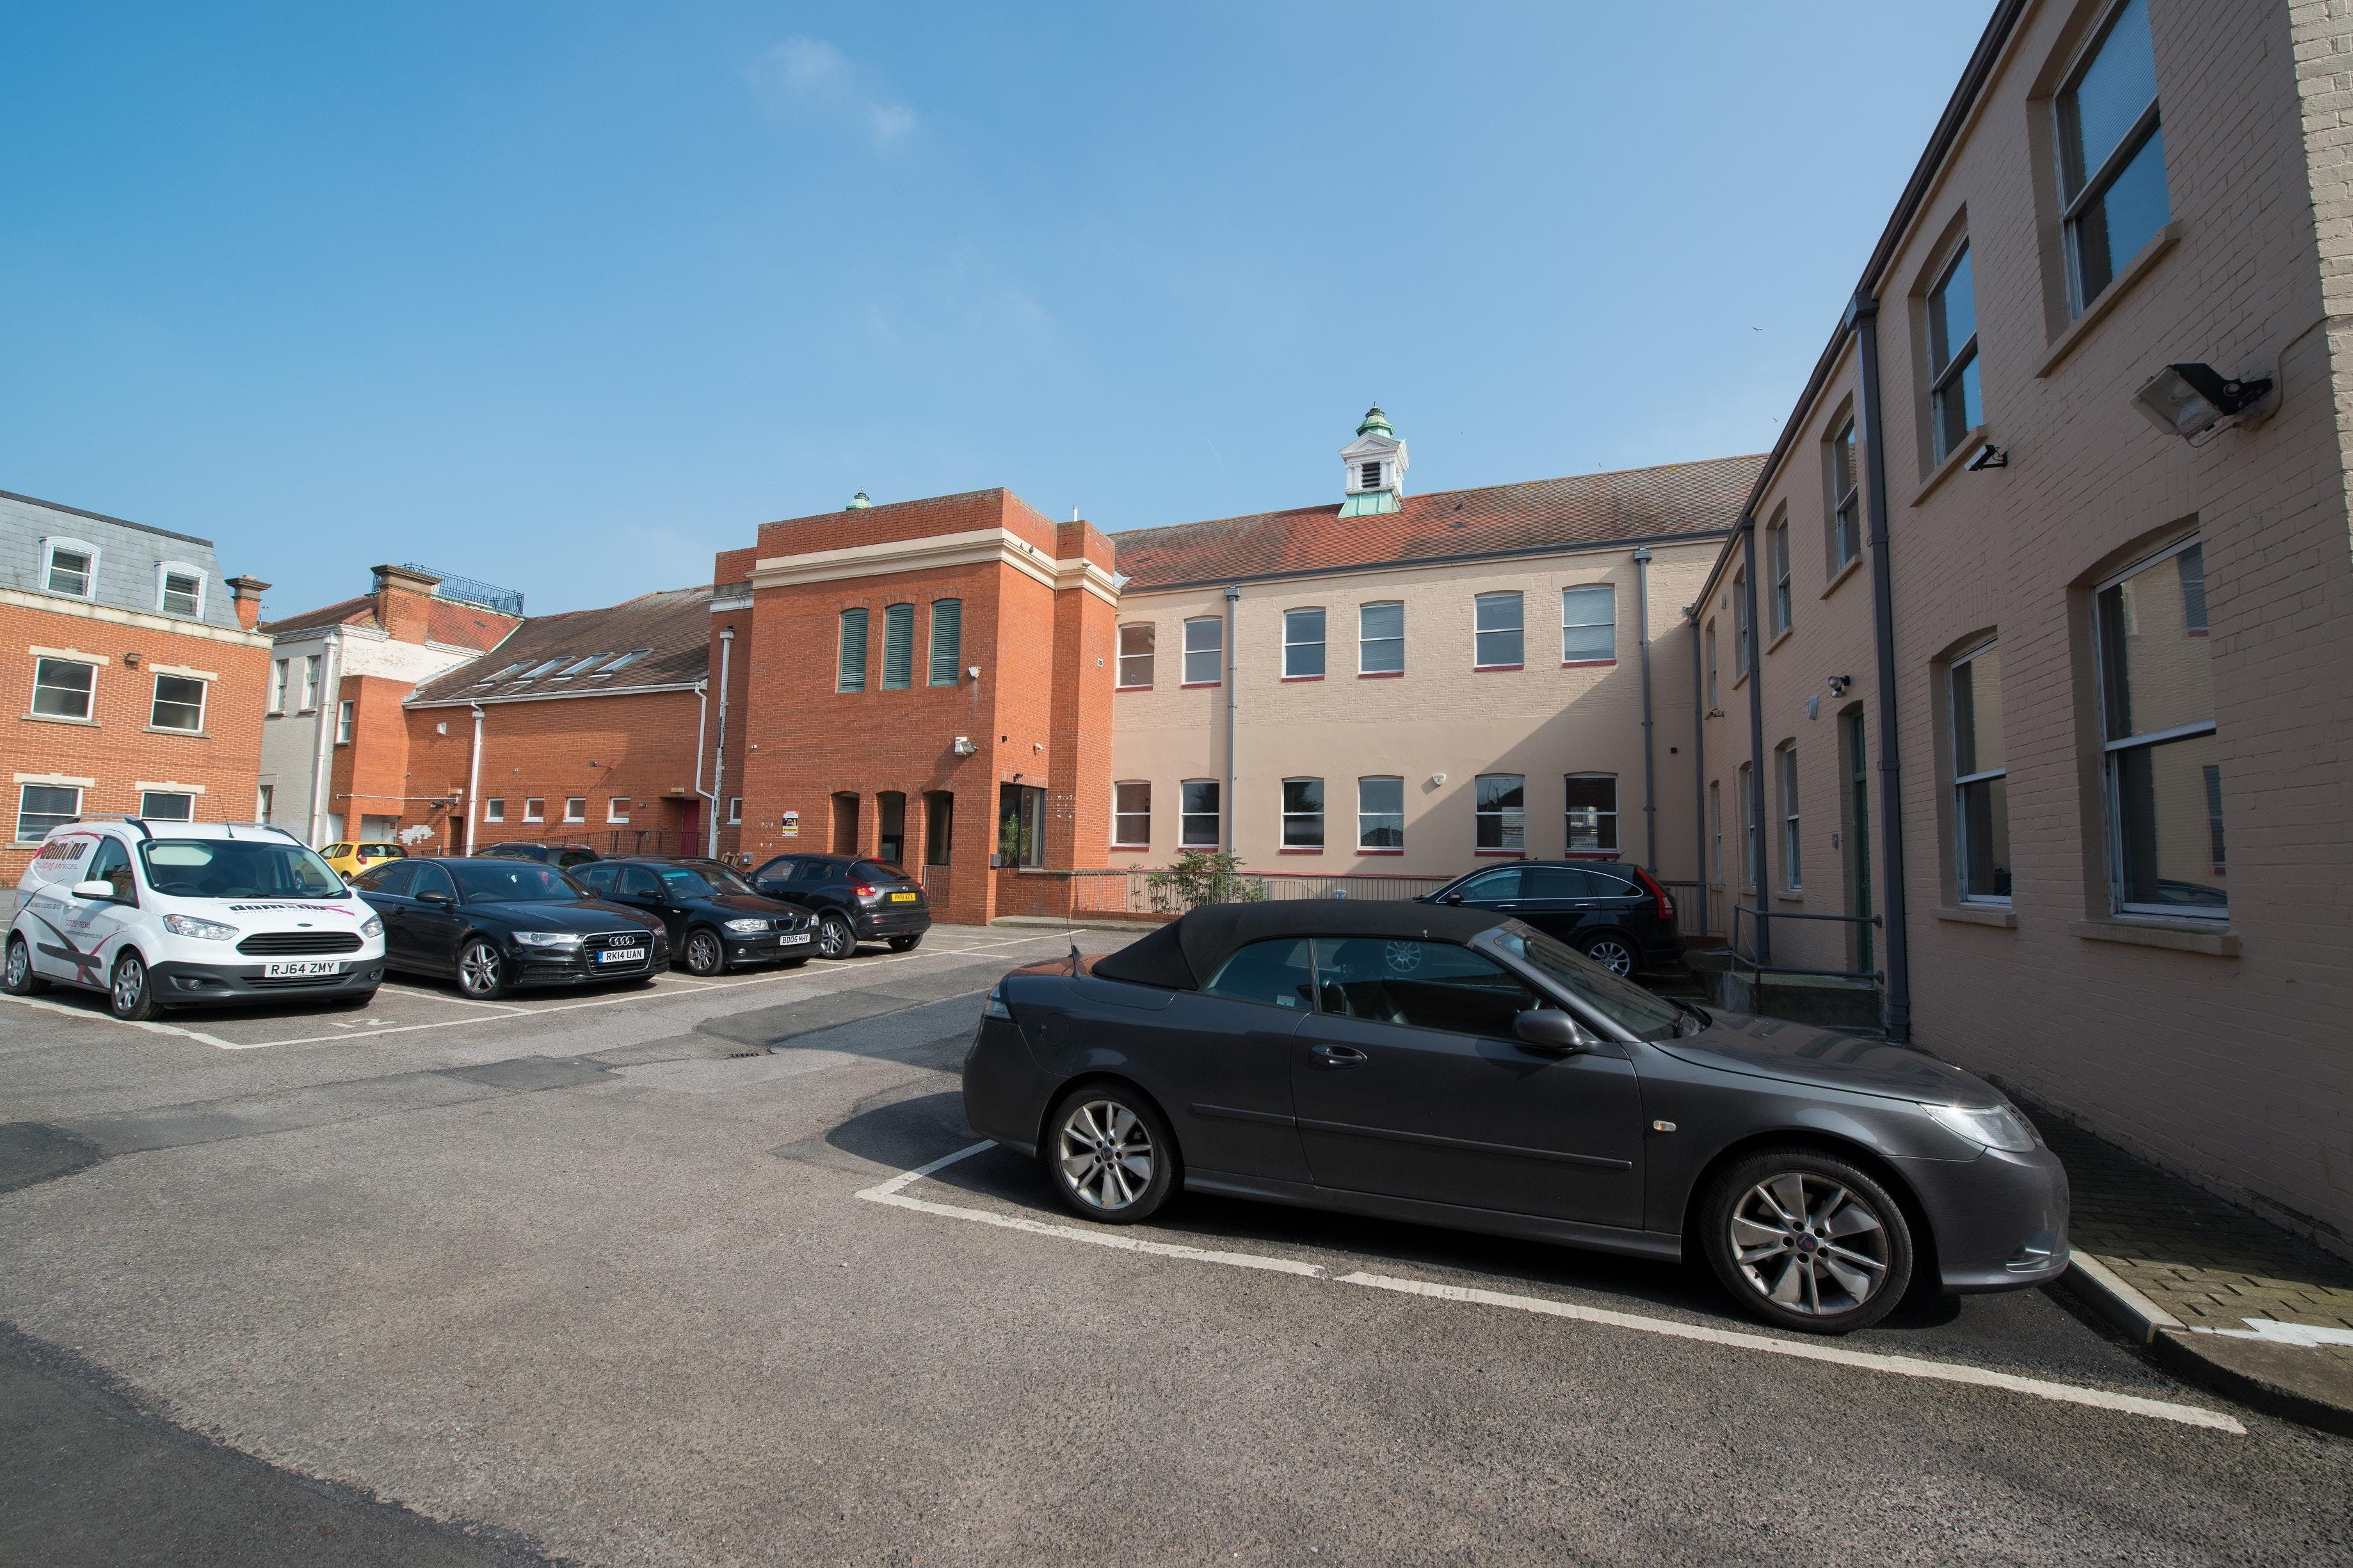 Admiral House, St Leonard's Road, Windsor, Office To Let - D80_2549_iPad.jpg